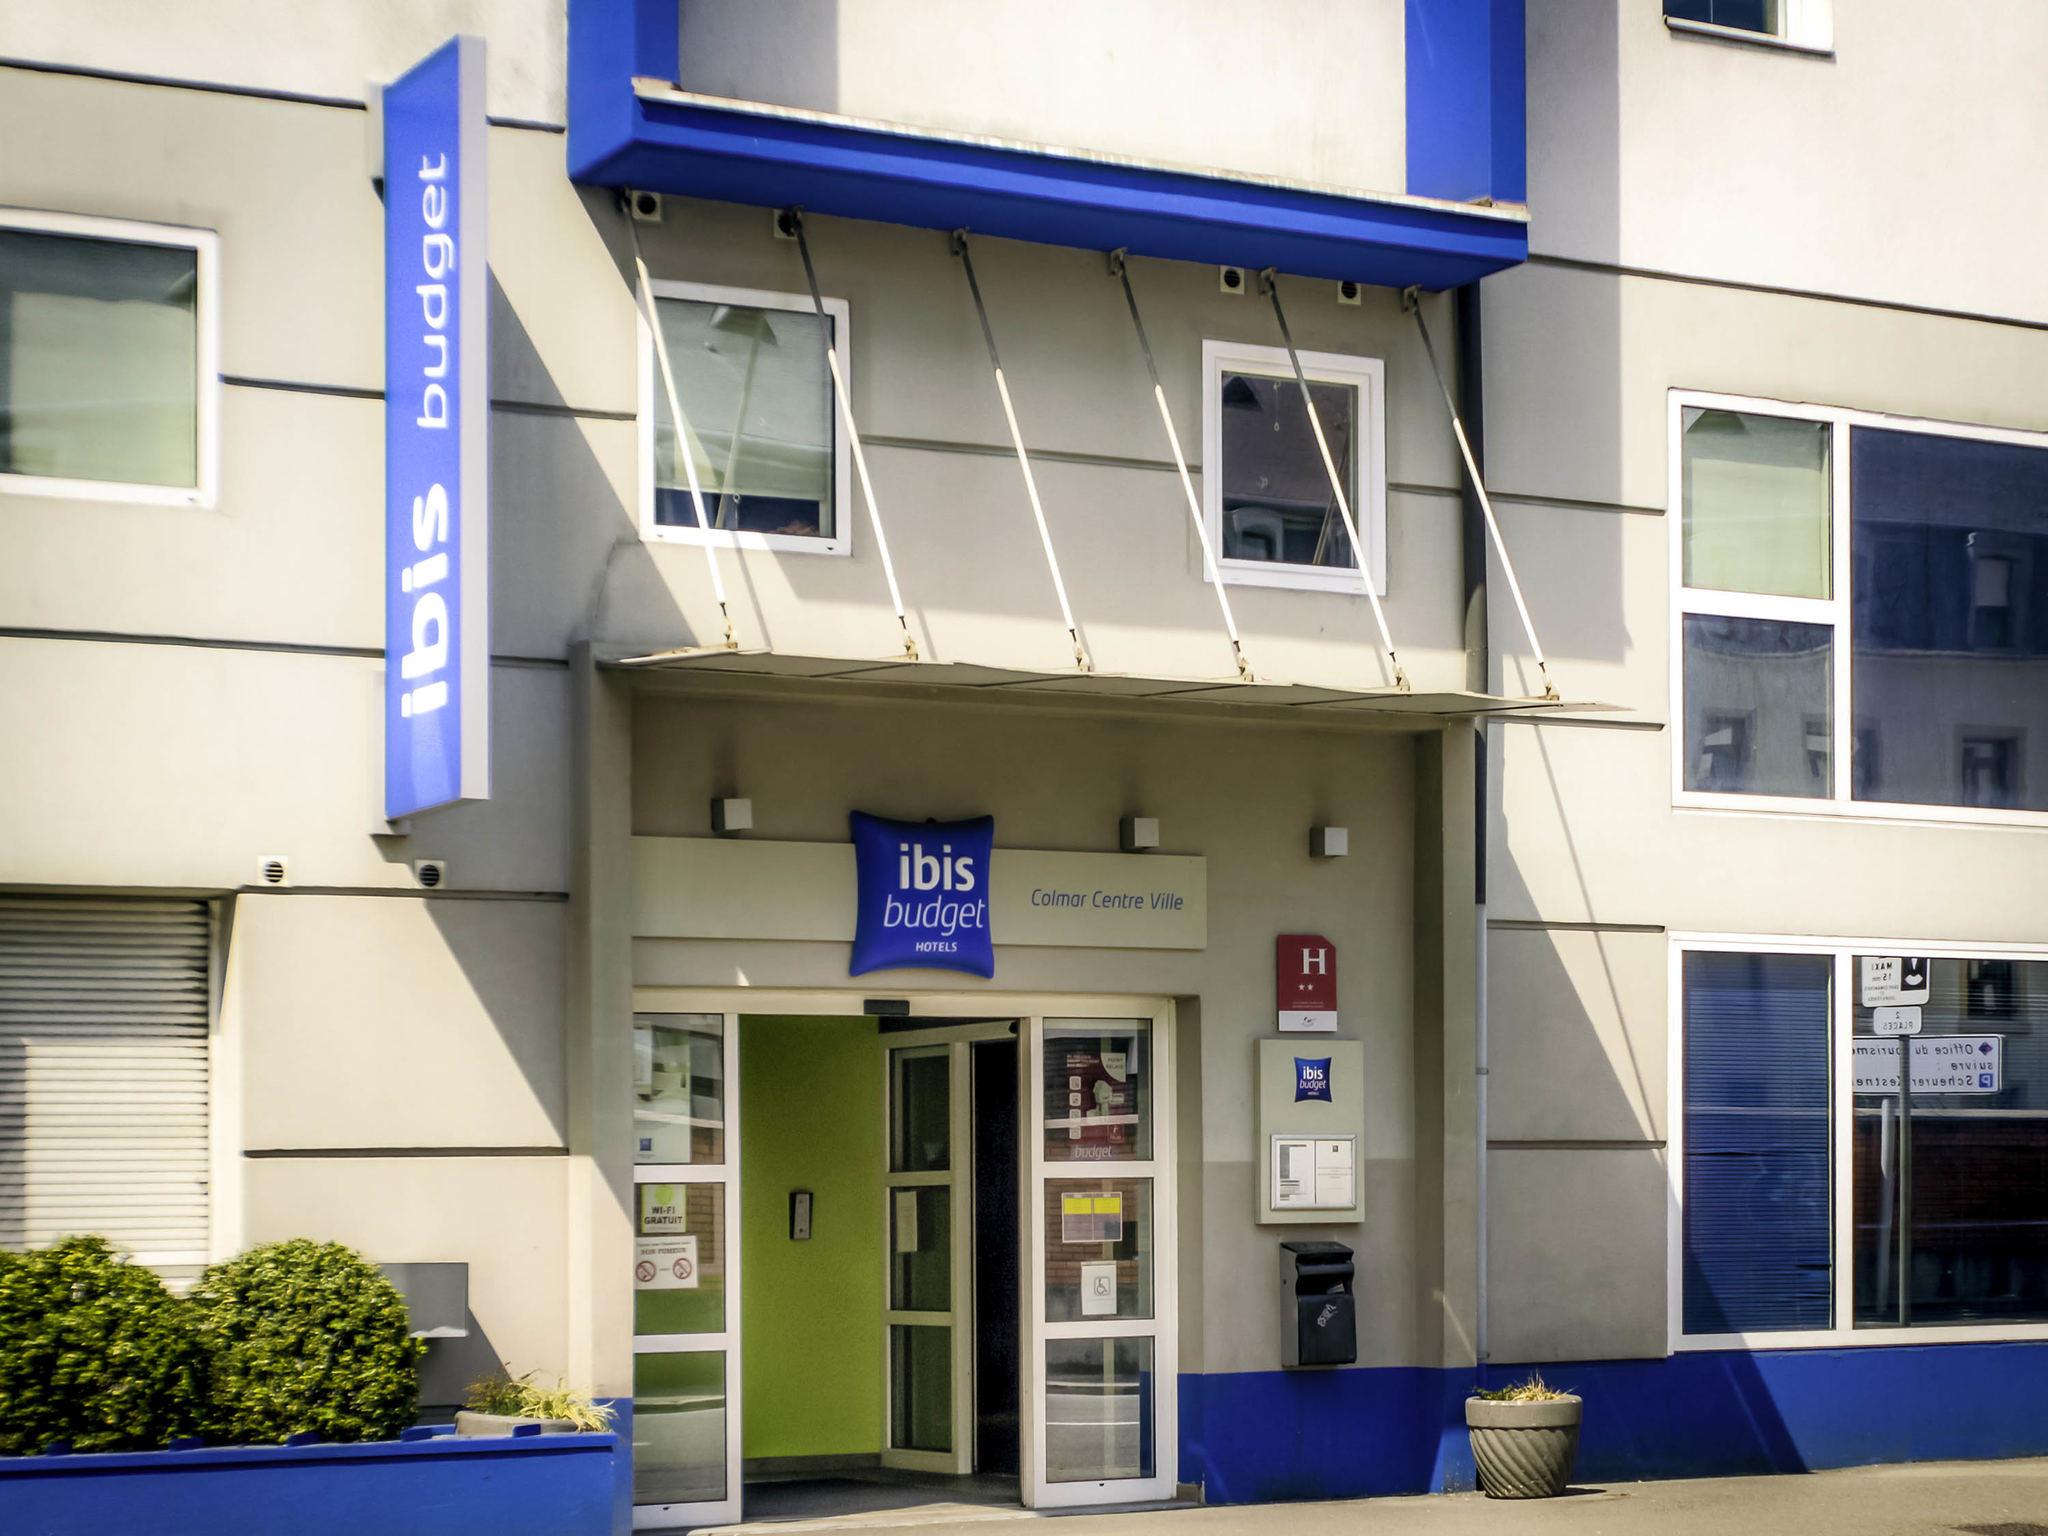 Hotel In Colmar Ibis Budget Colmar Centre Ville